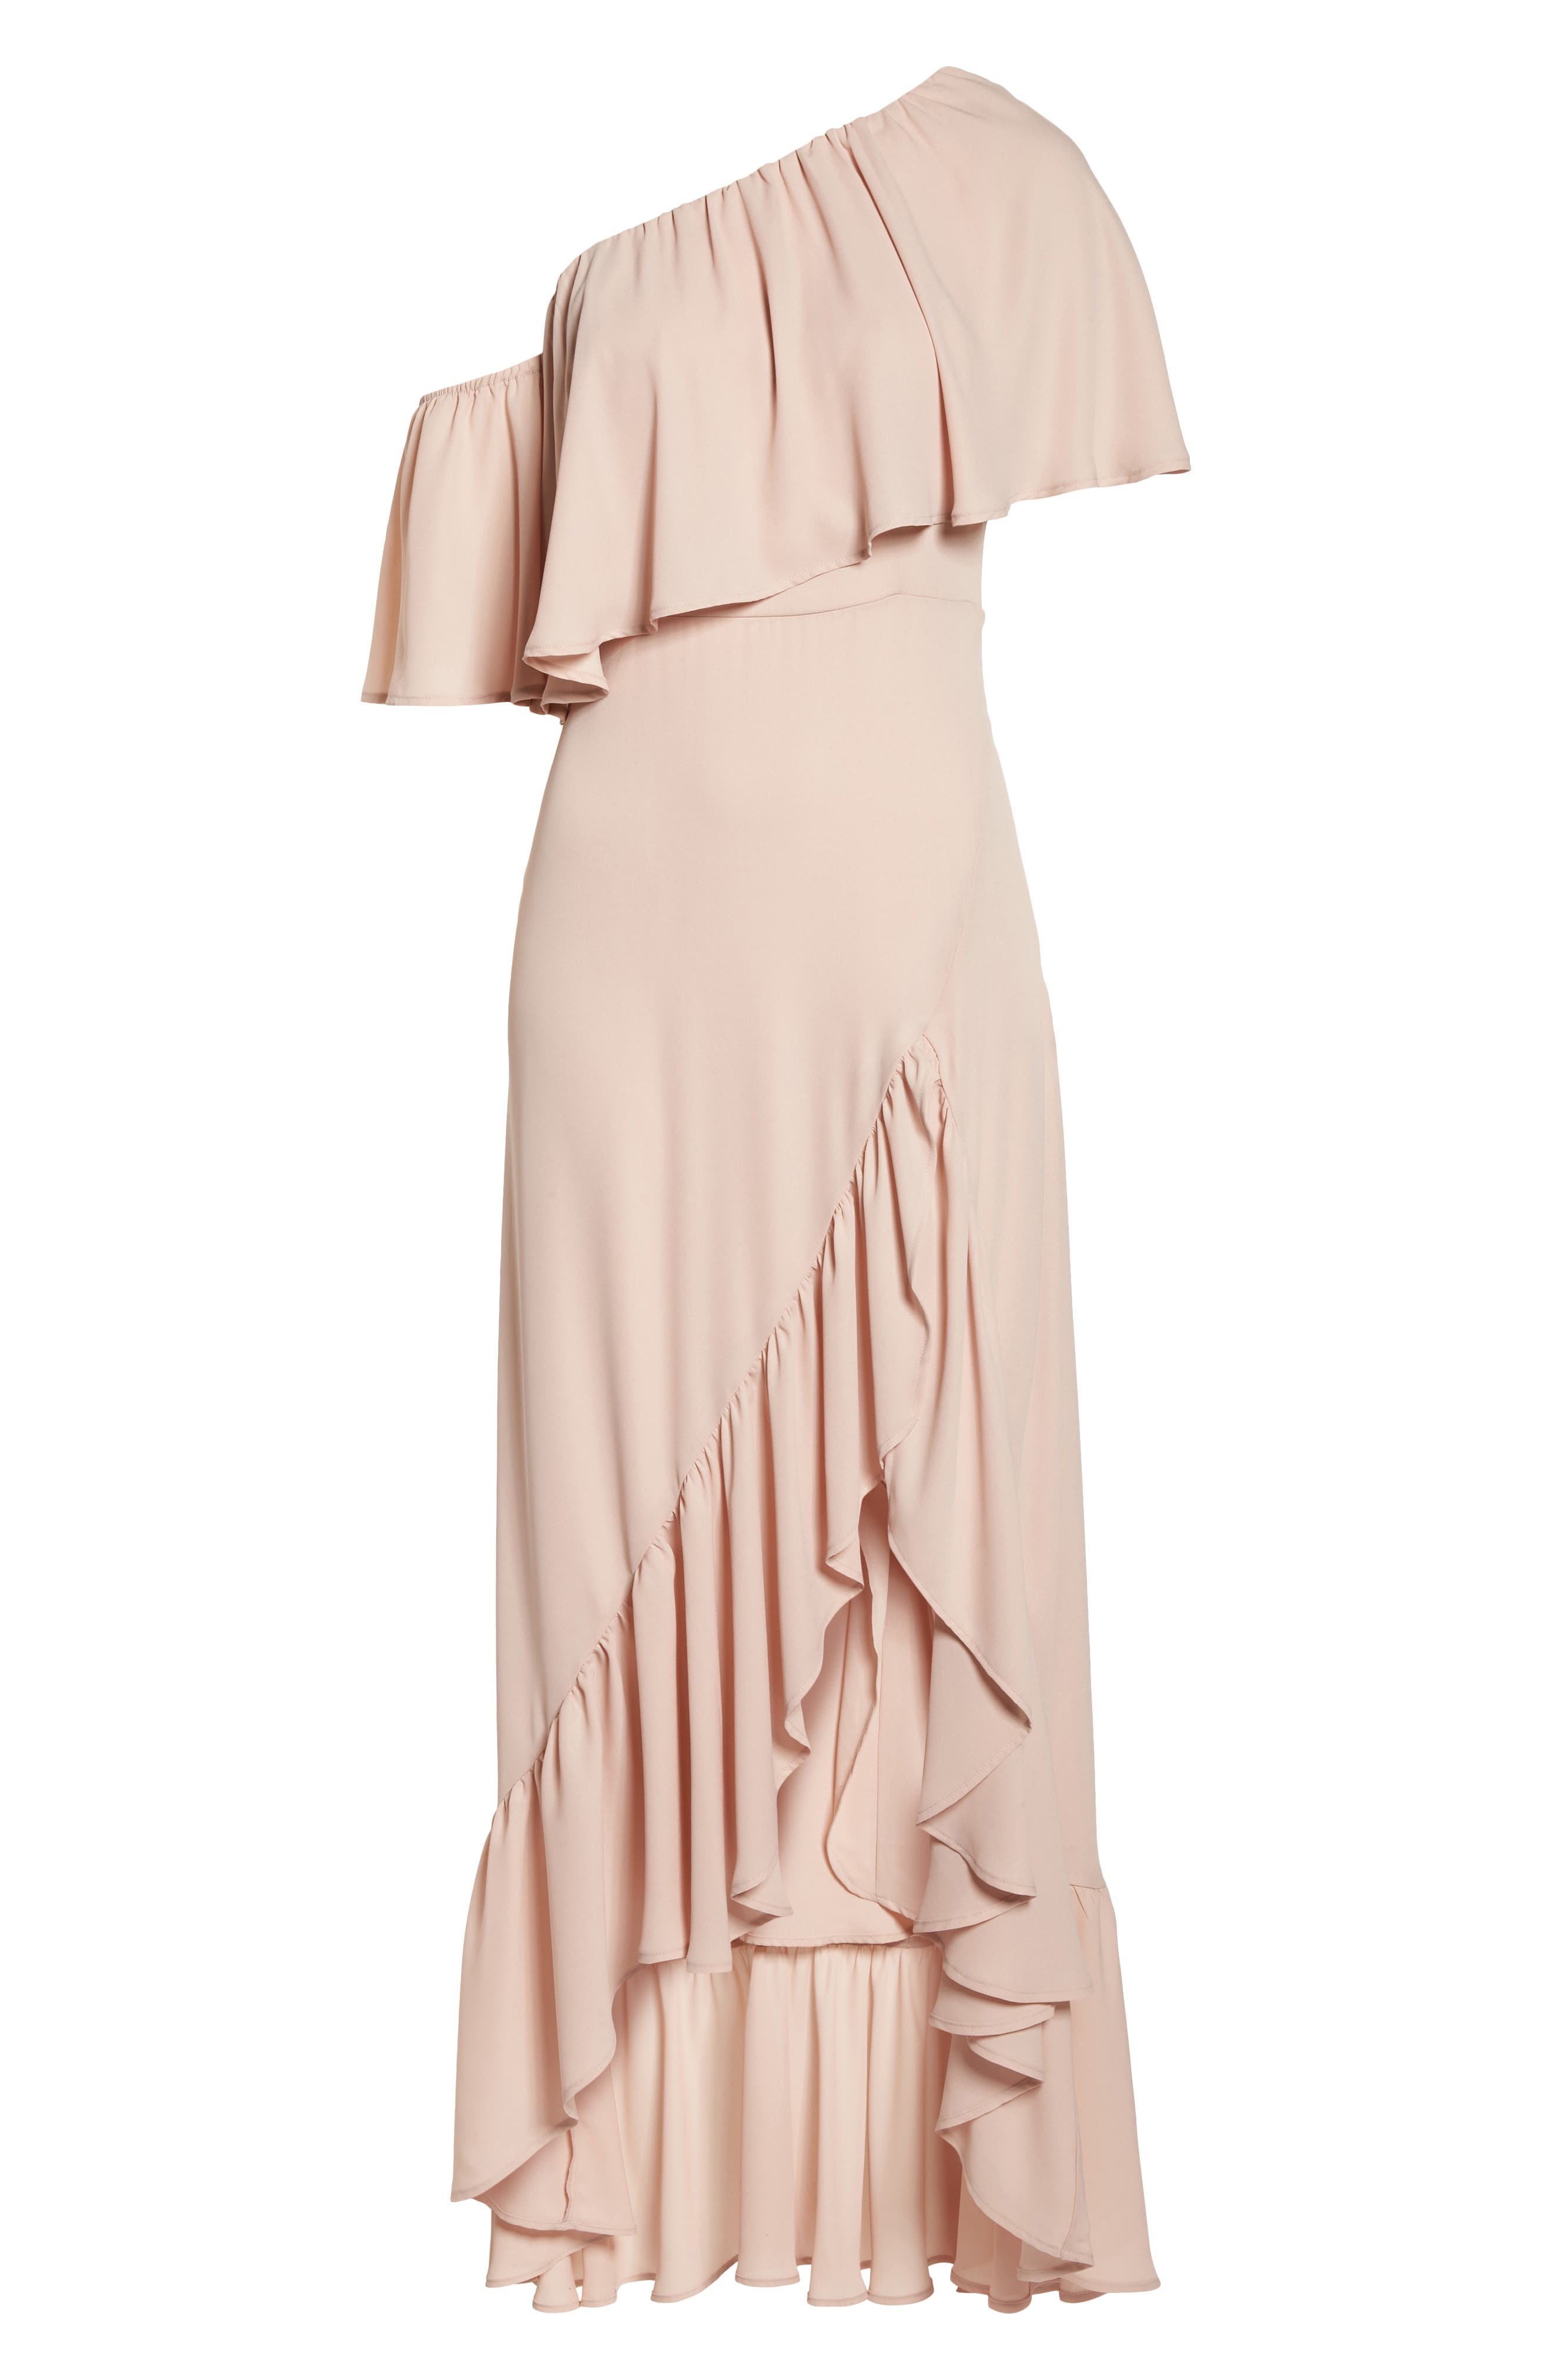 Tango Ruffle Gown,                             Alternate thumbnail 6, color,                             Dusty Blush Crisp